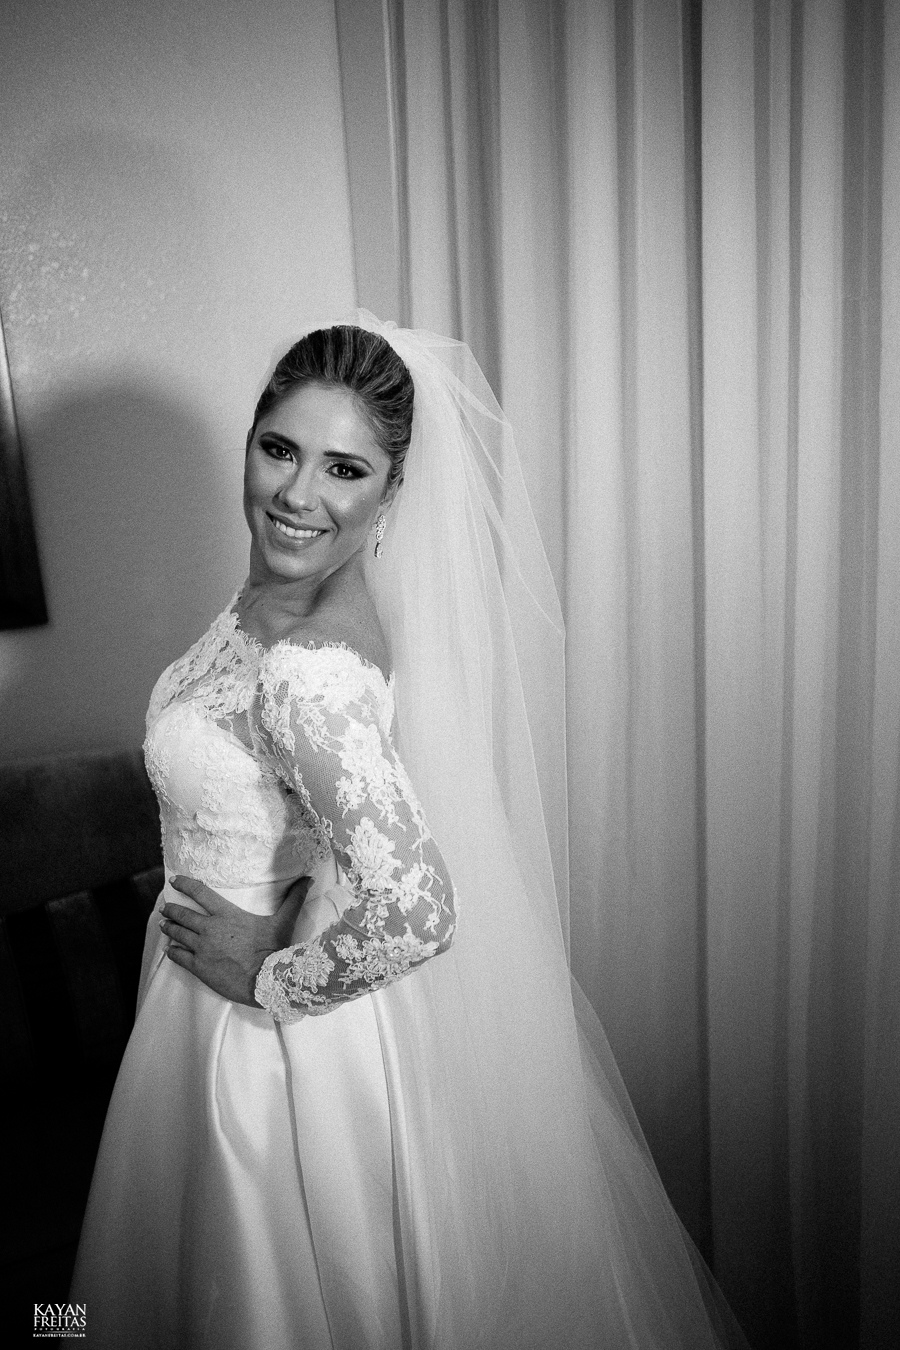 casamento-catedral-pea-0051 Casamento em Florianópolis - Priscilla e Anderson - Veleiros da Ilha